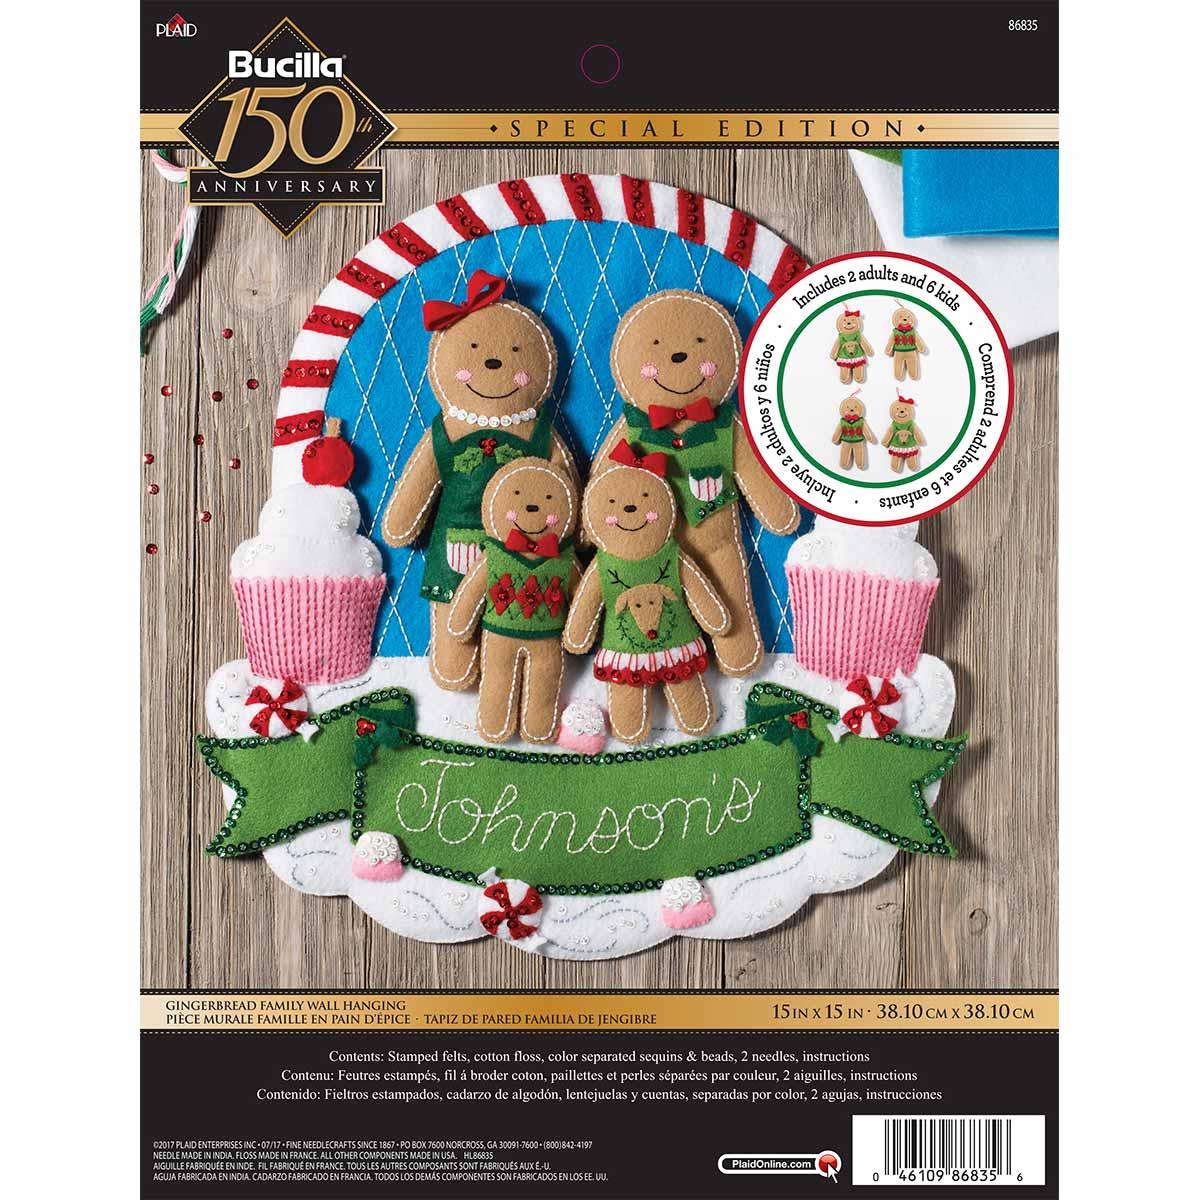 Bucilla ® Seasonal - Felt - Home Decor - Gingerbread Family Wall Hanging - 86835